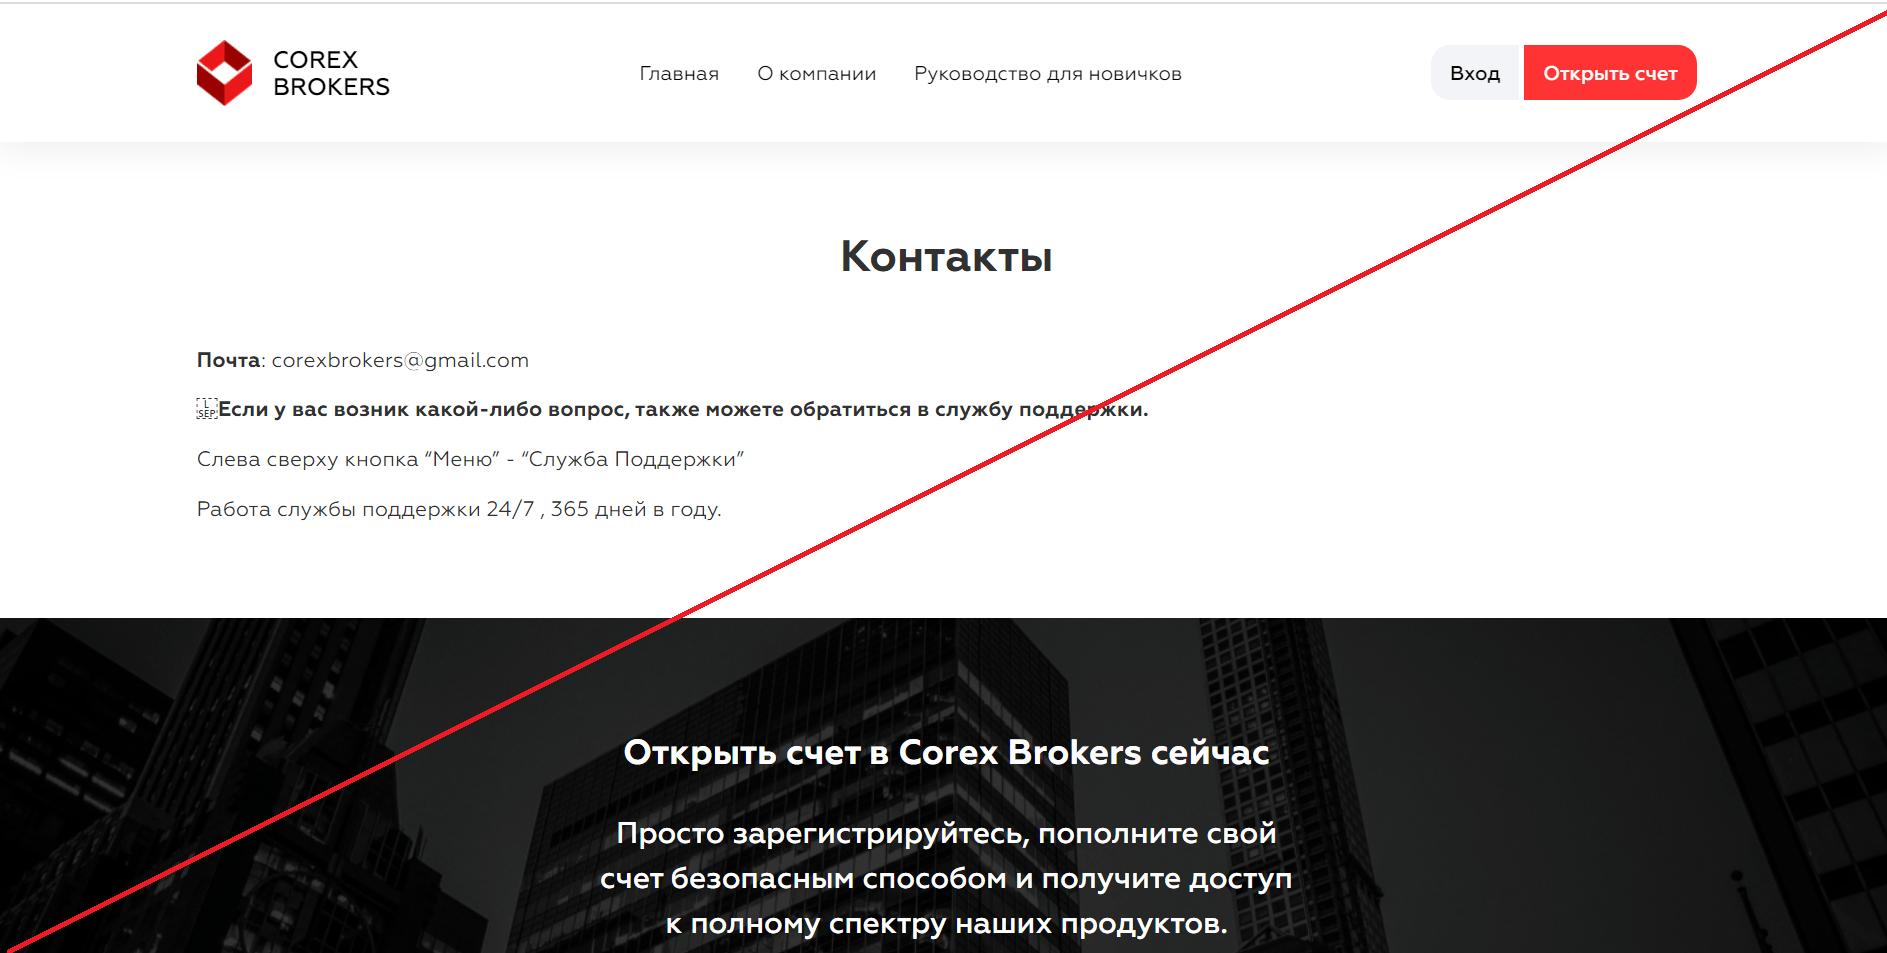 Corex Brokers - Мошенники